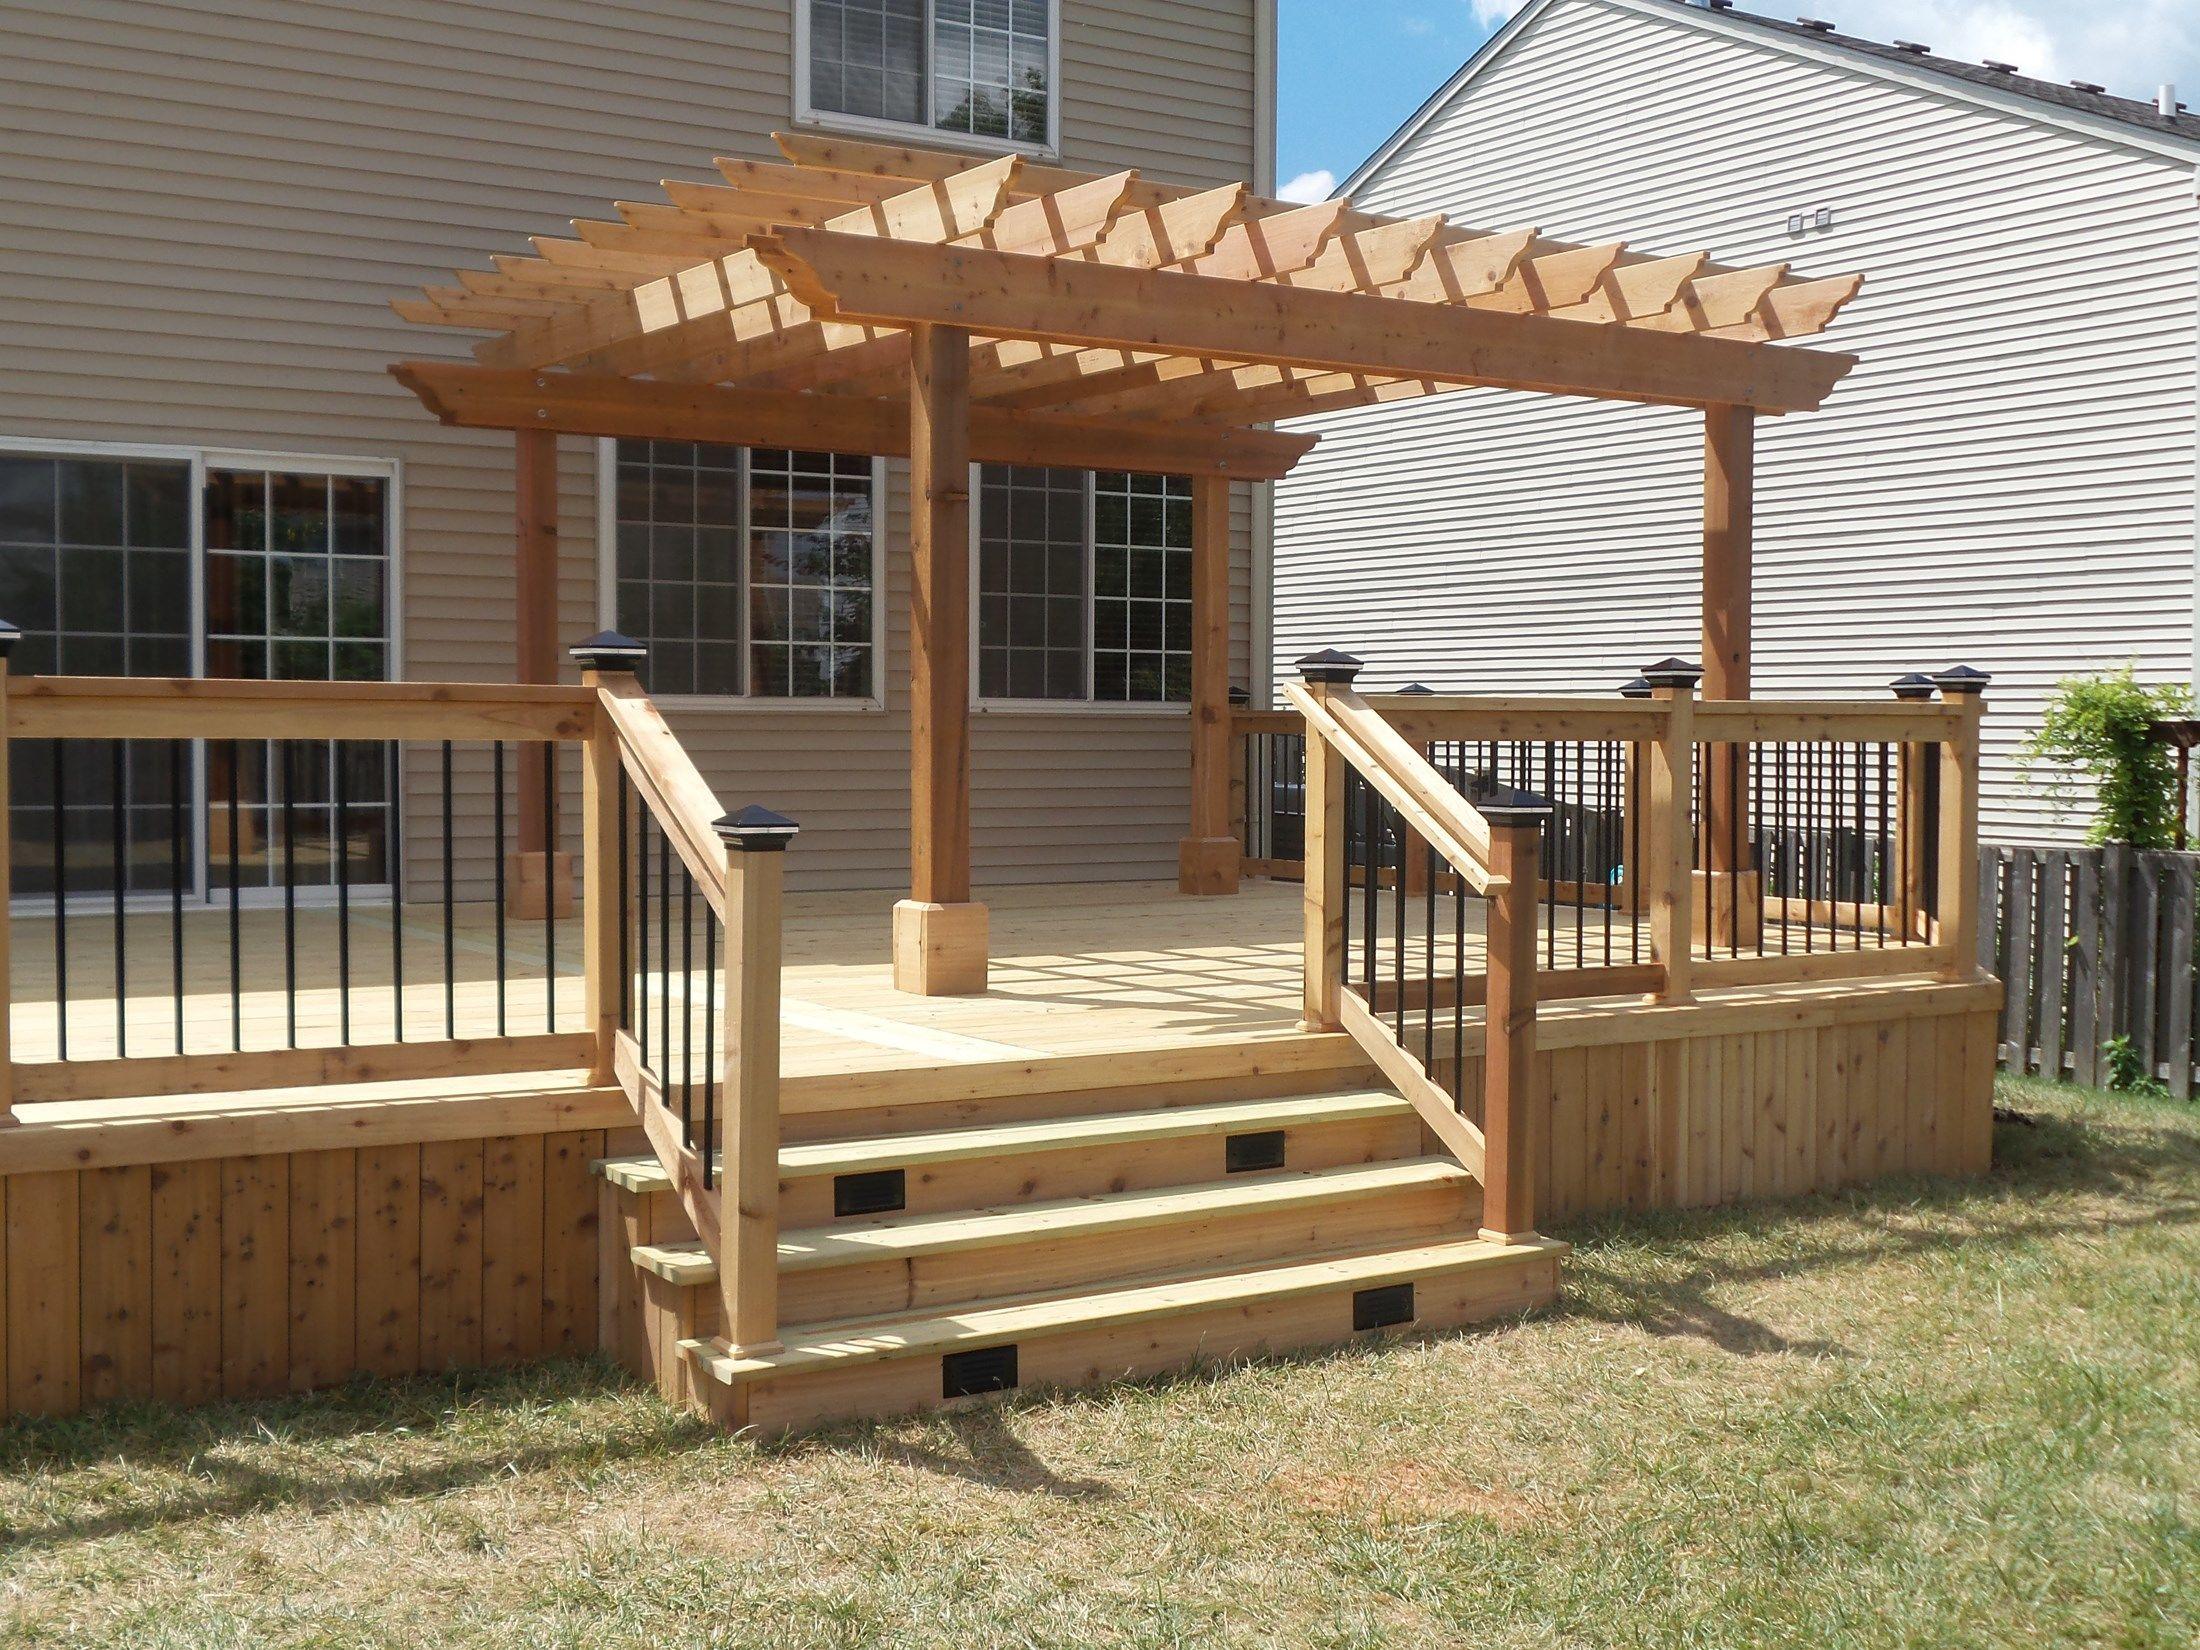 Ground Level Deck Ideas Designs Amp Pictures Wood Rail